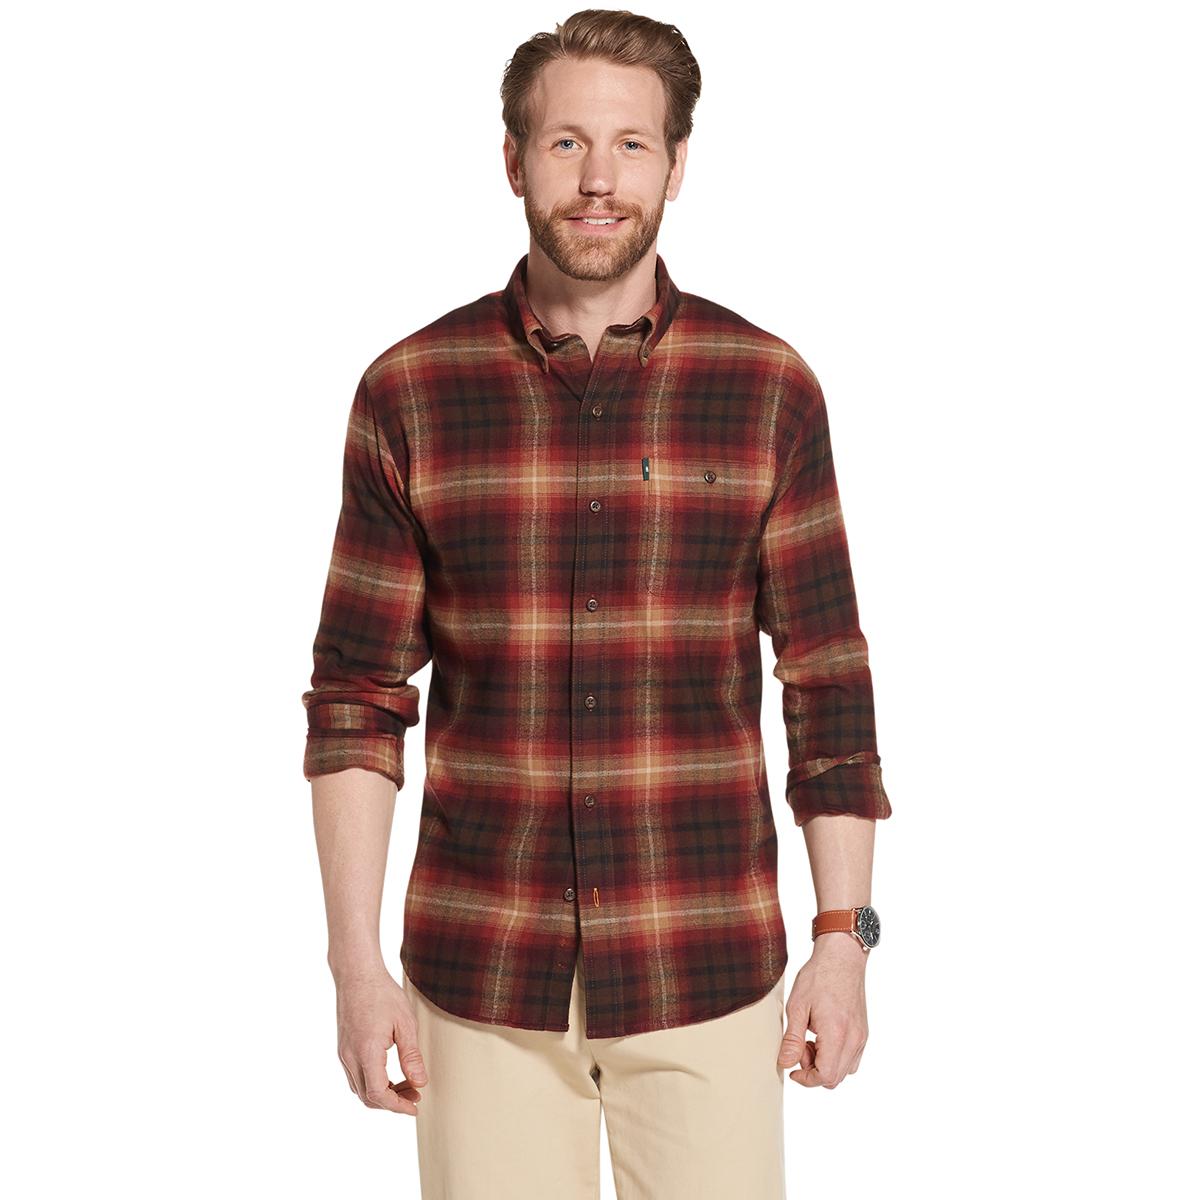 G.H.BASS & CO. Men's Fireside Plaid Flannel - Red, L